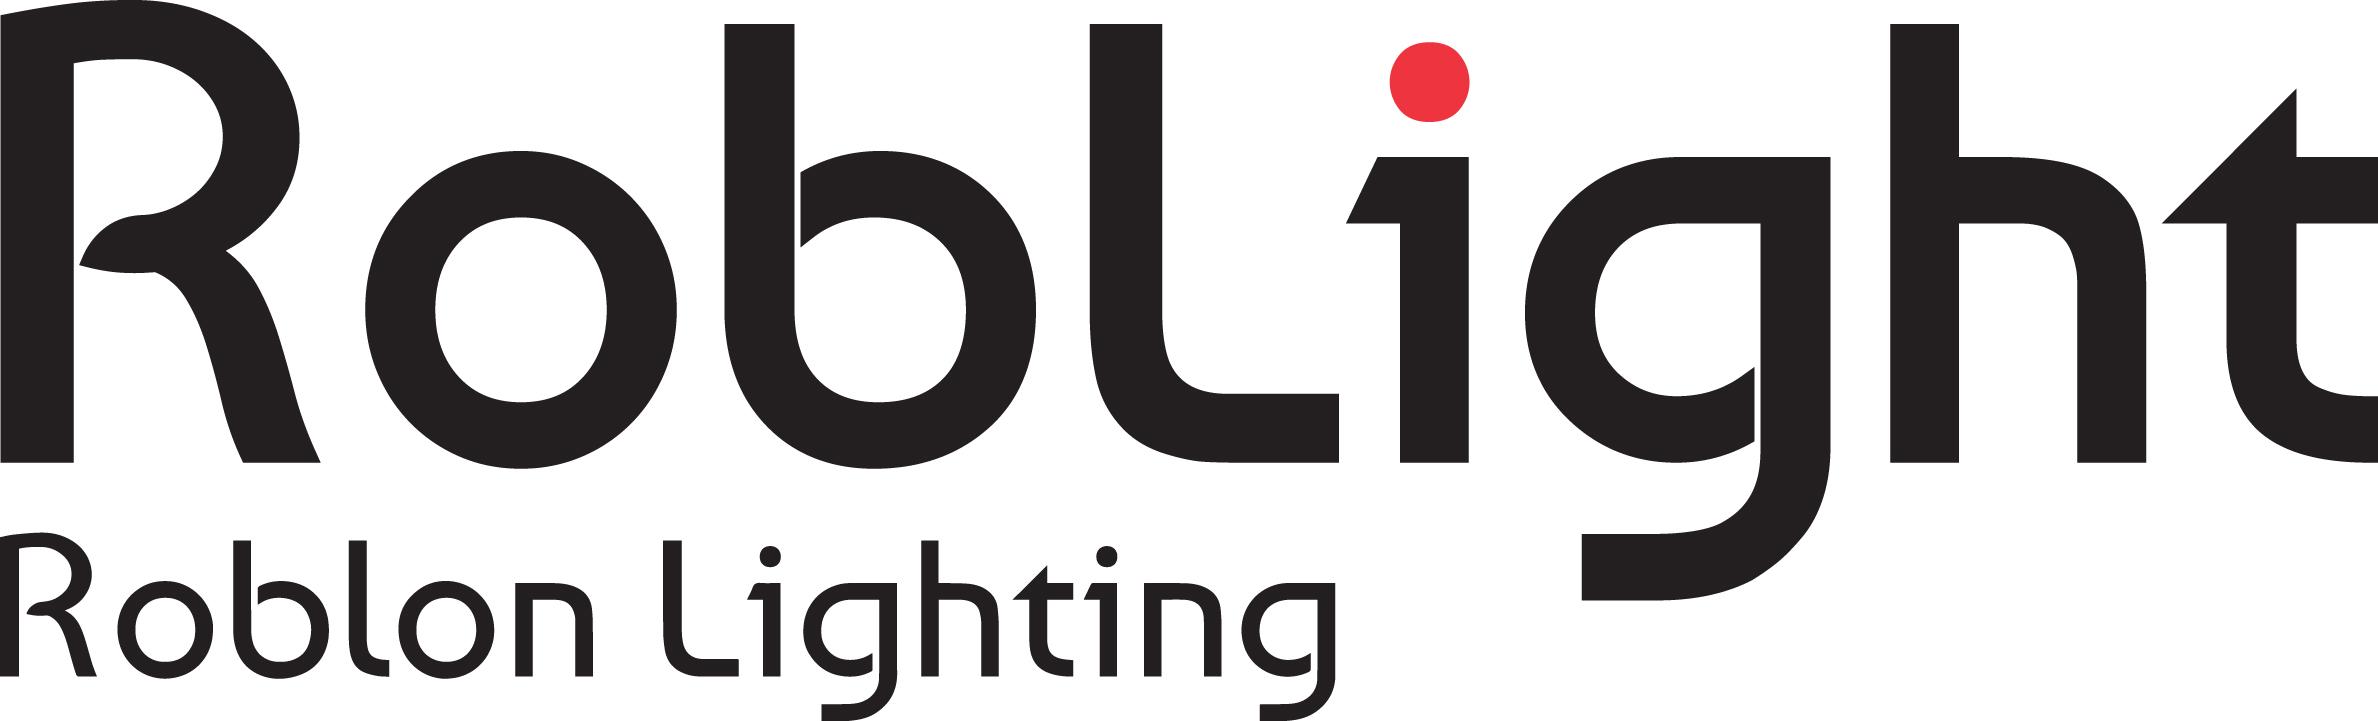 RobLight_Roblon-Lighting_Black-Redjpg